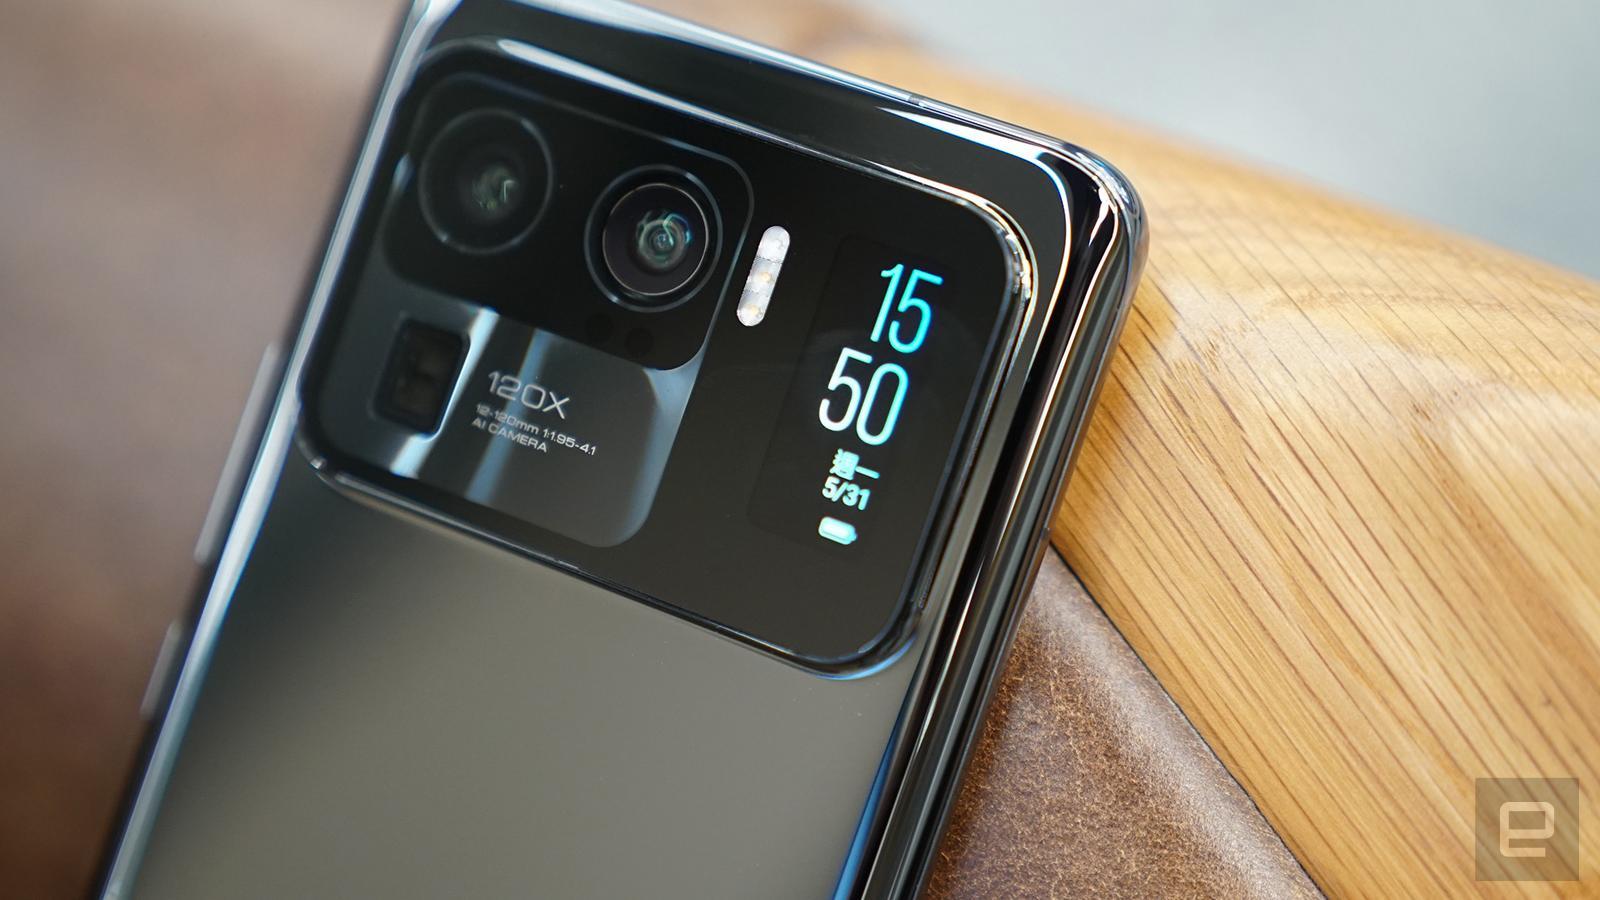 MWC2021公布最佳智能手机TOP5:一加手机上榜,与苹果三星并列